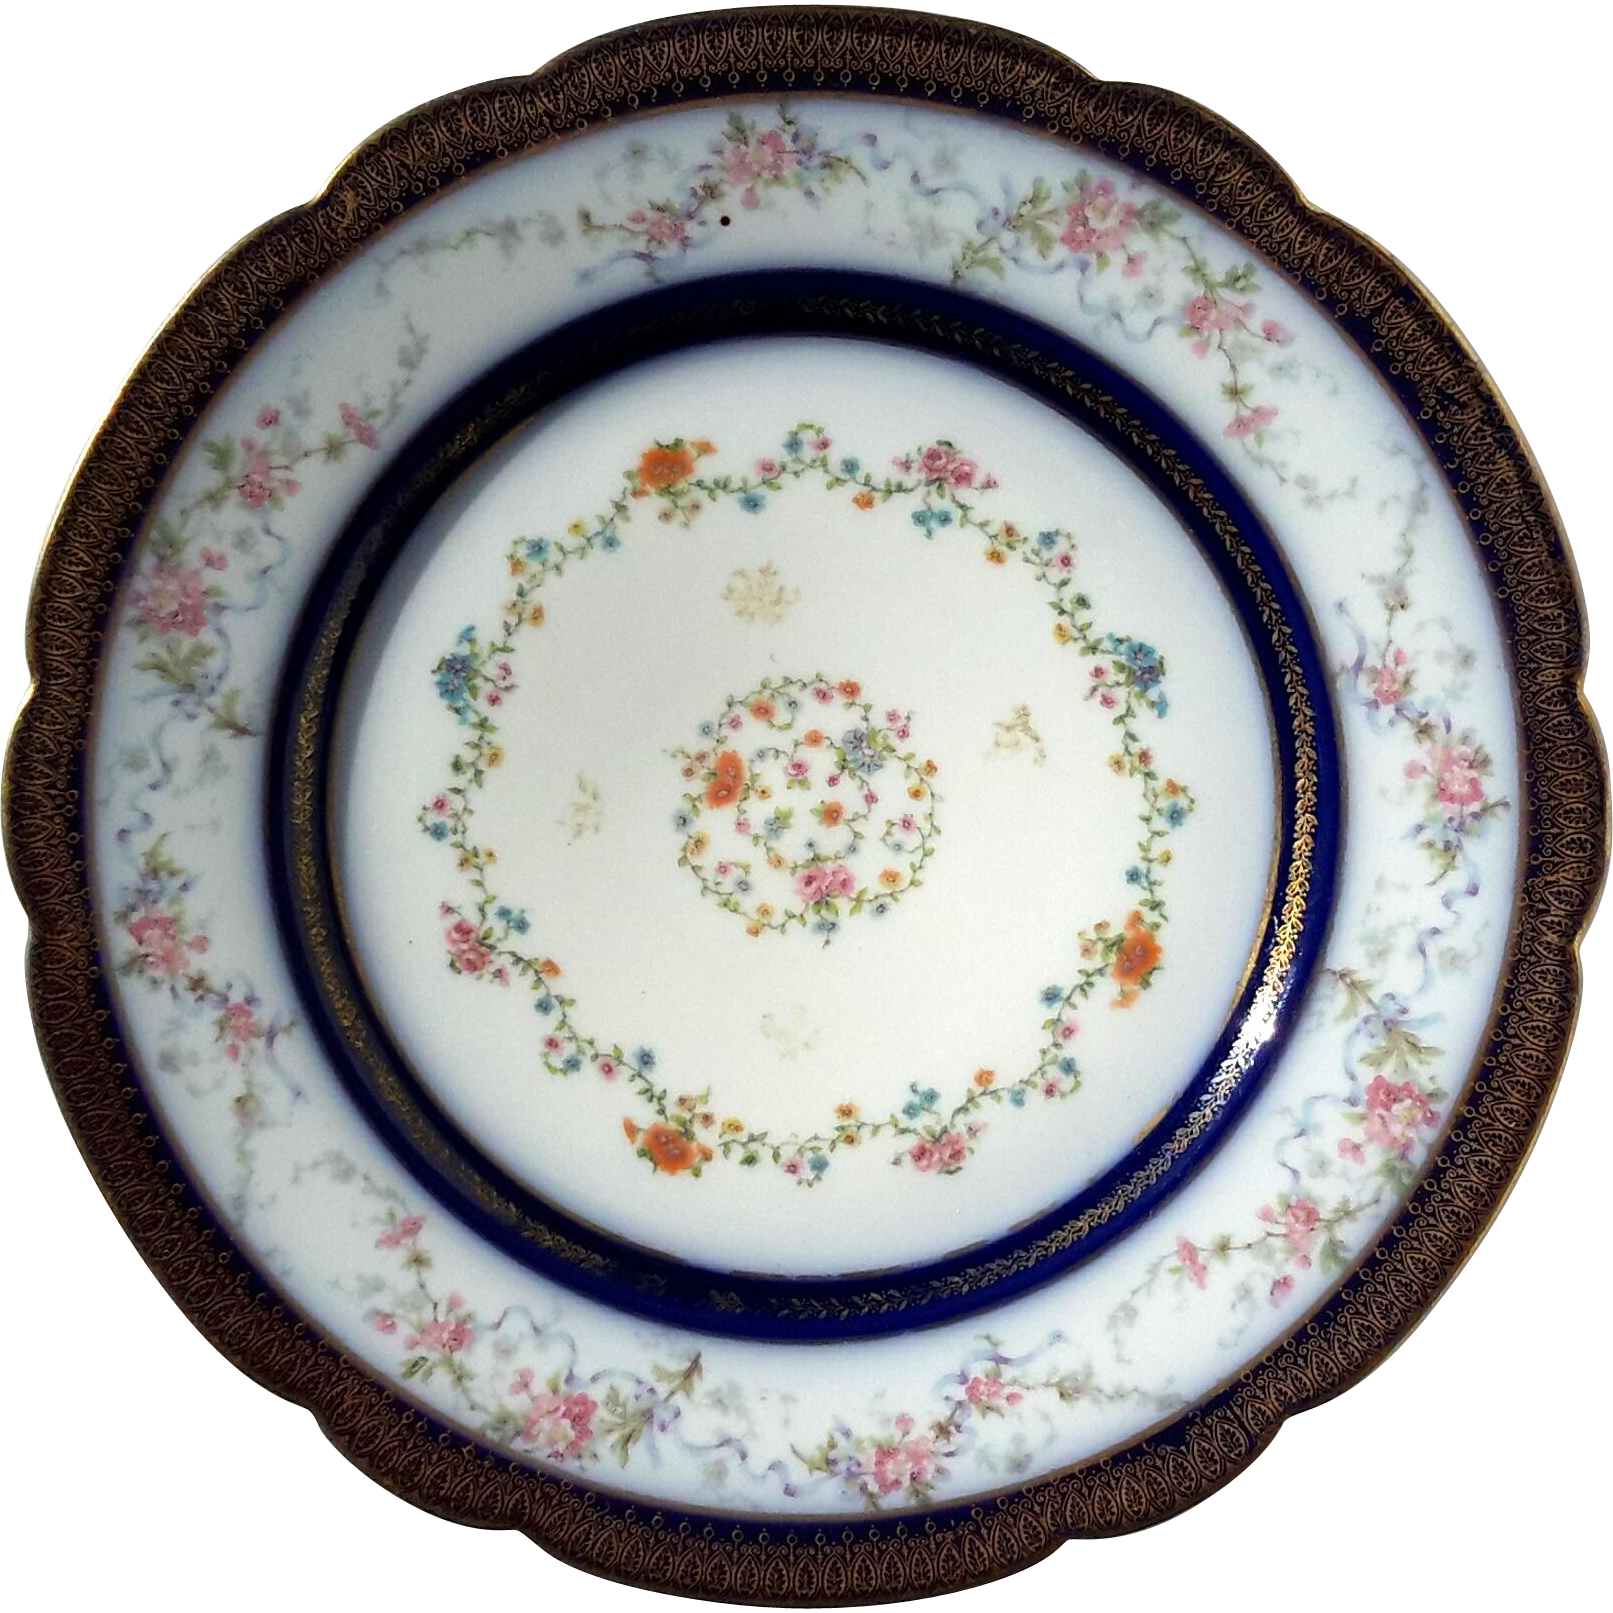 Antique French Haviland Limoges Porcelain Plate From